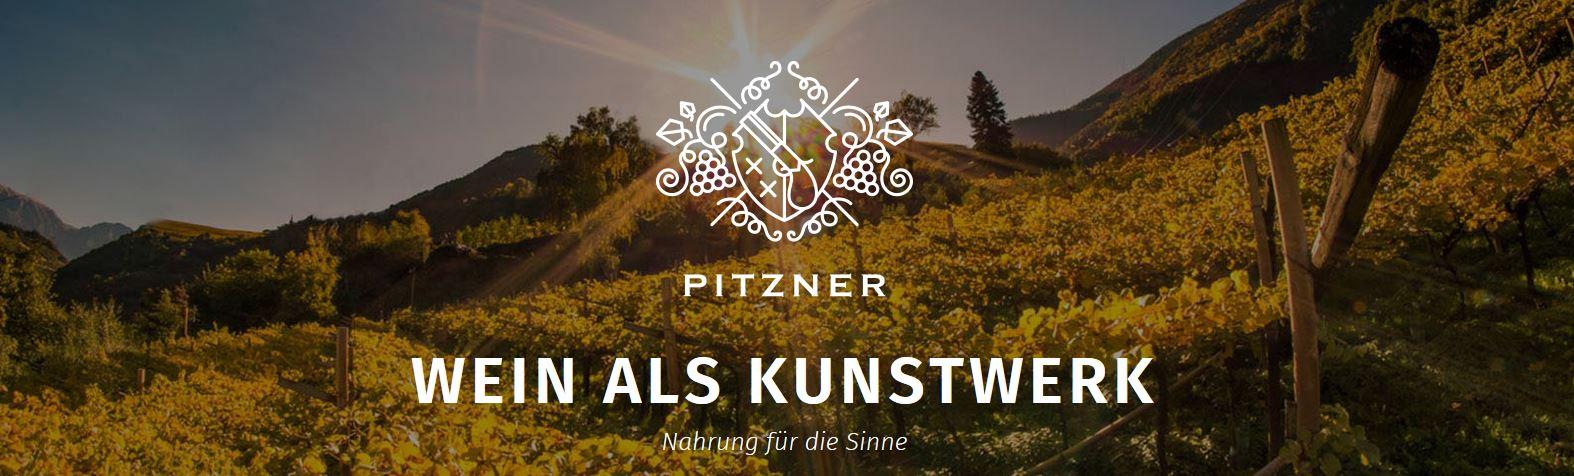 weingut-Pitzner5968d867307a2